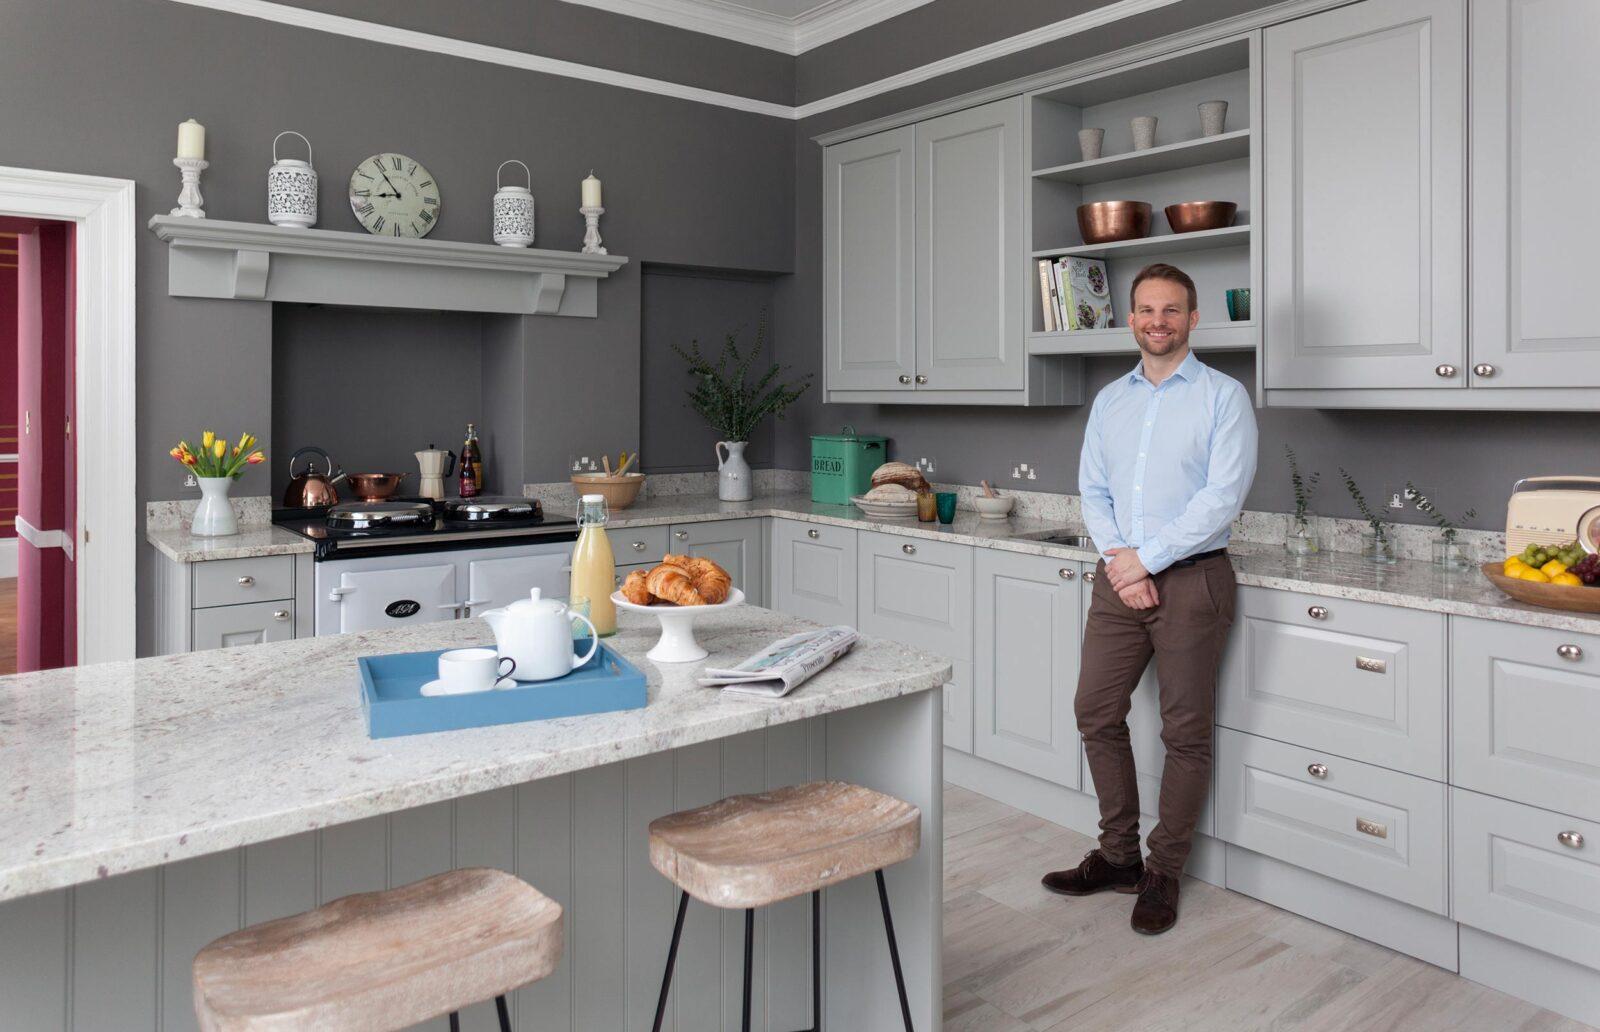 James Horsfall, Managing Director of Bath Kitchen Company